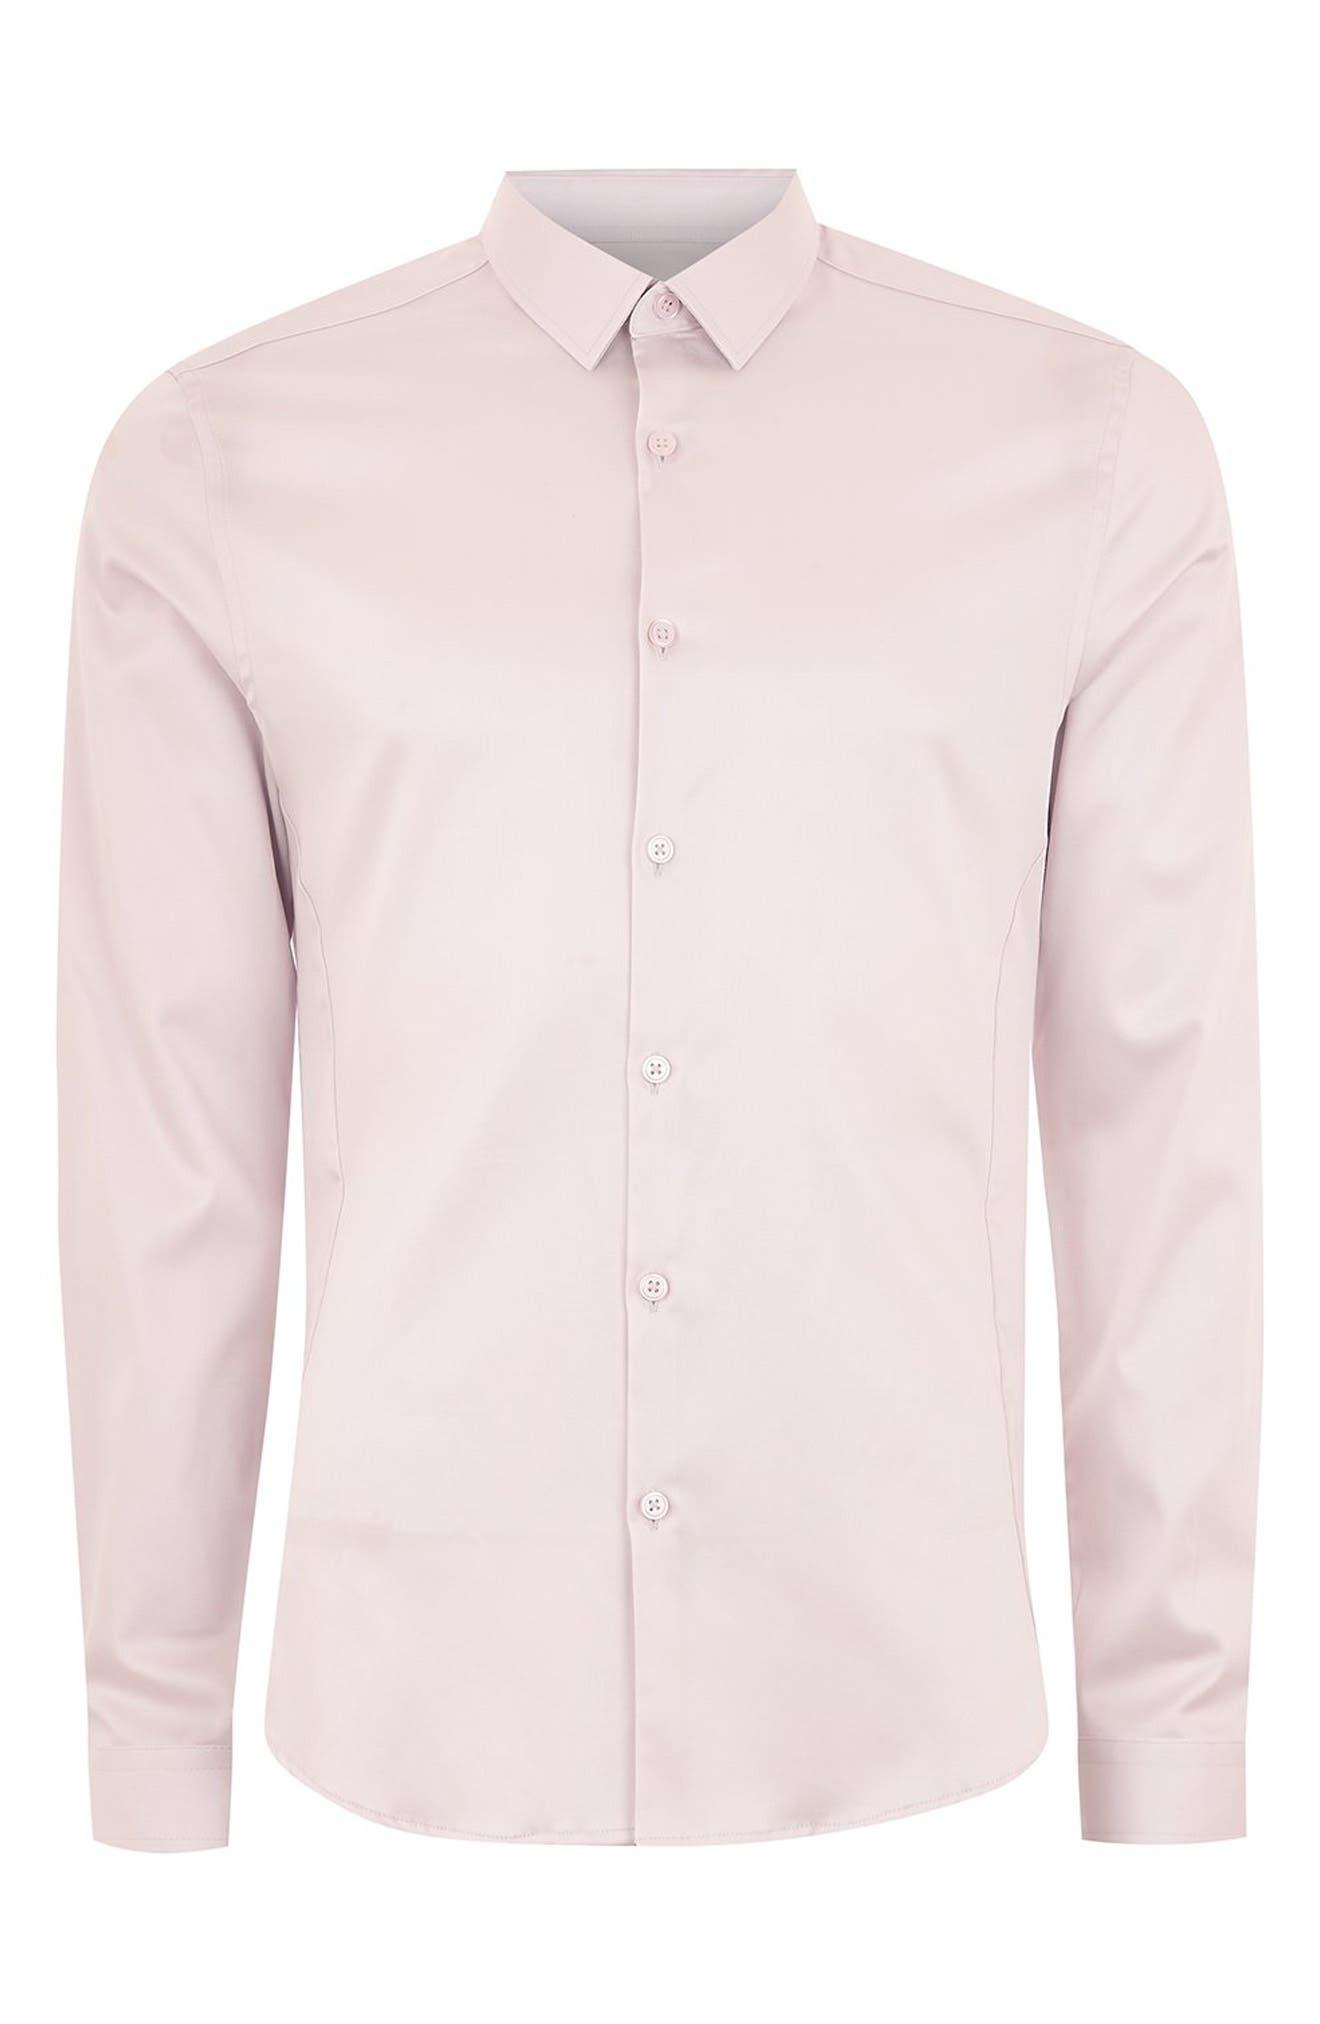 Satin Stretch Classic Fit Shirt,                             Alternate thumbnail 3, color,                             PURPLE